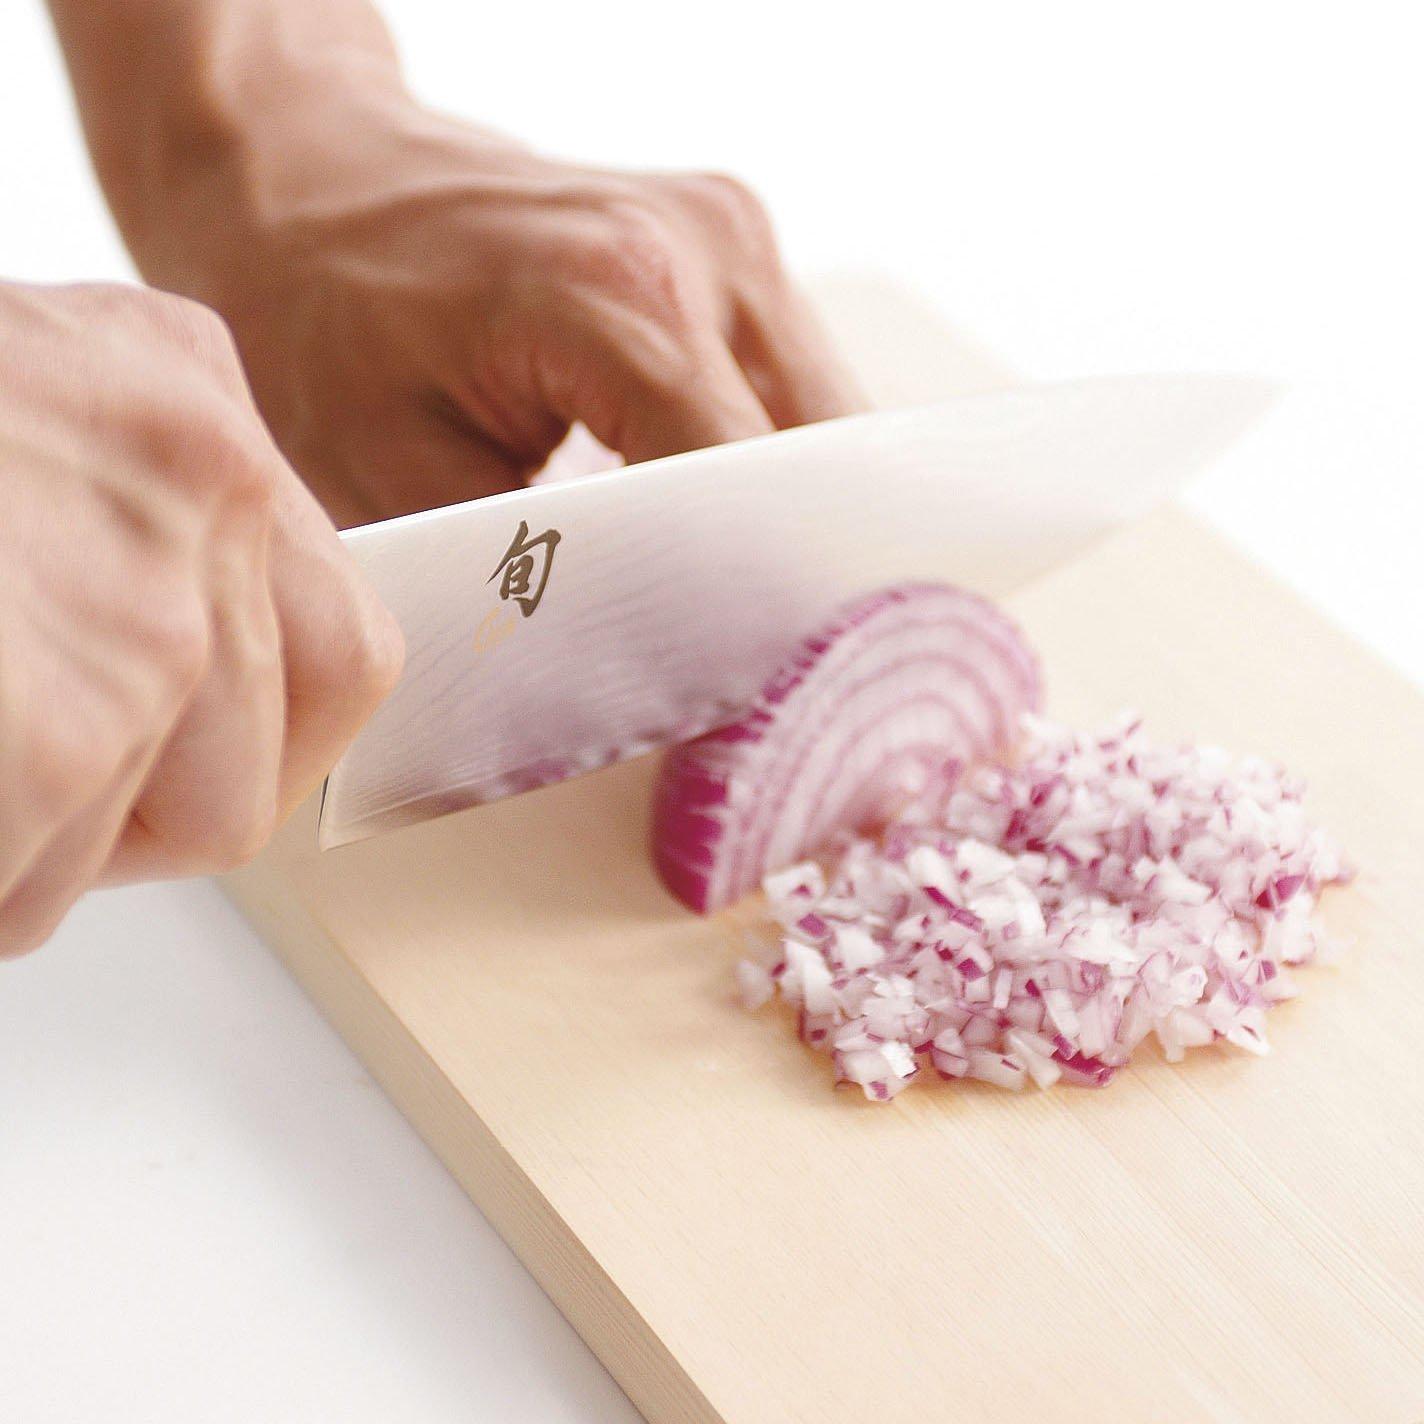 Shun TDM0702 Premier Santoku Knife, 7-Inch & Kai Diamond and Ceramic Retractable Knife Sharpener (Bundle)